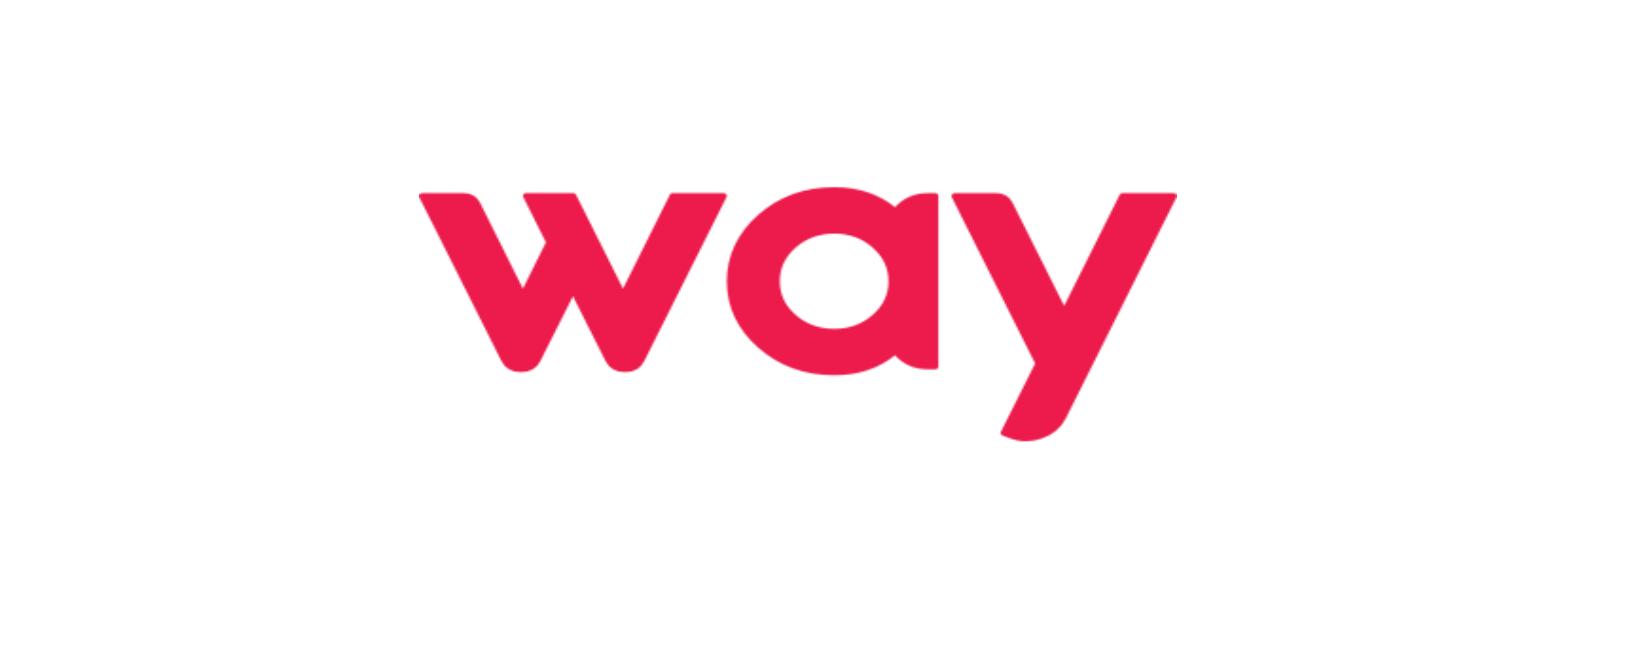 Way.com Discount Code 2021